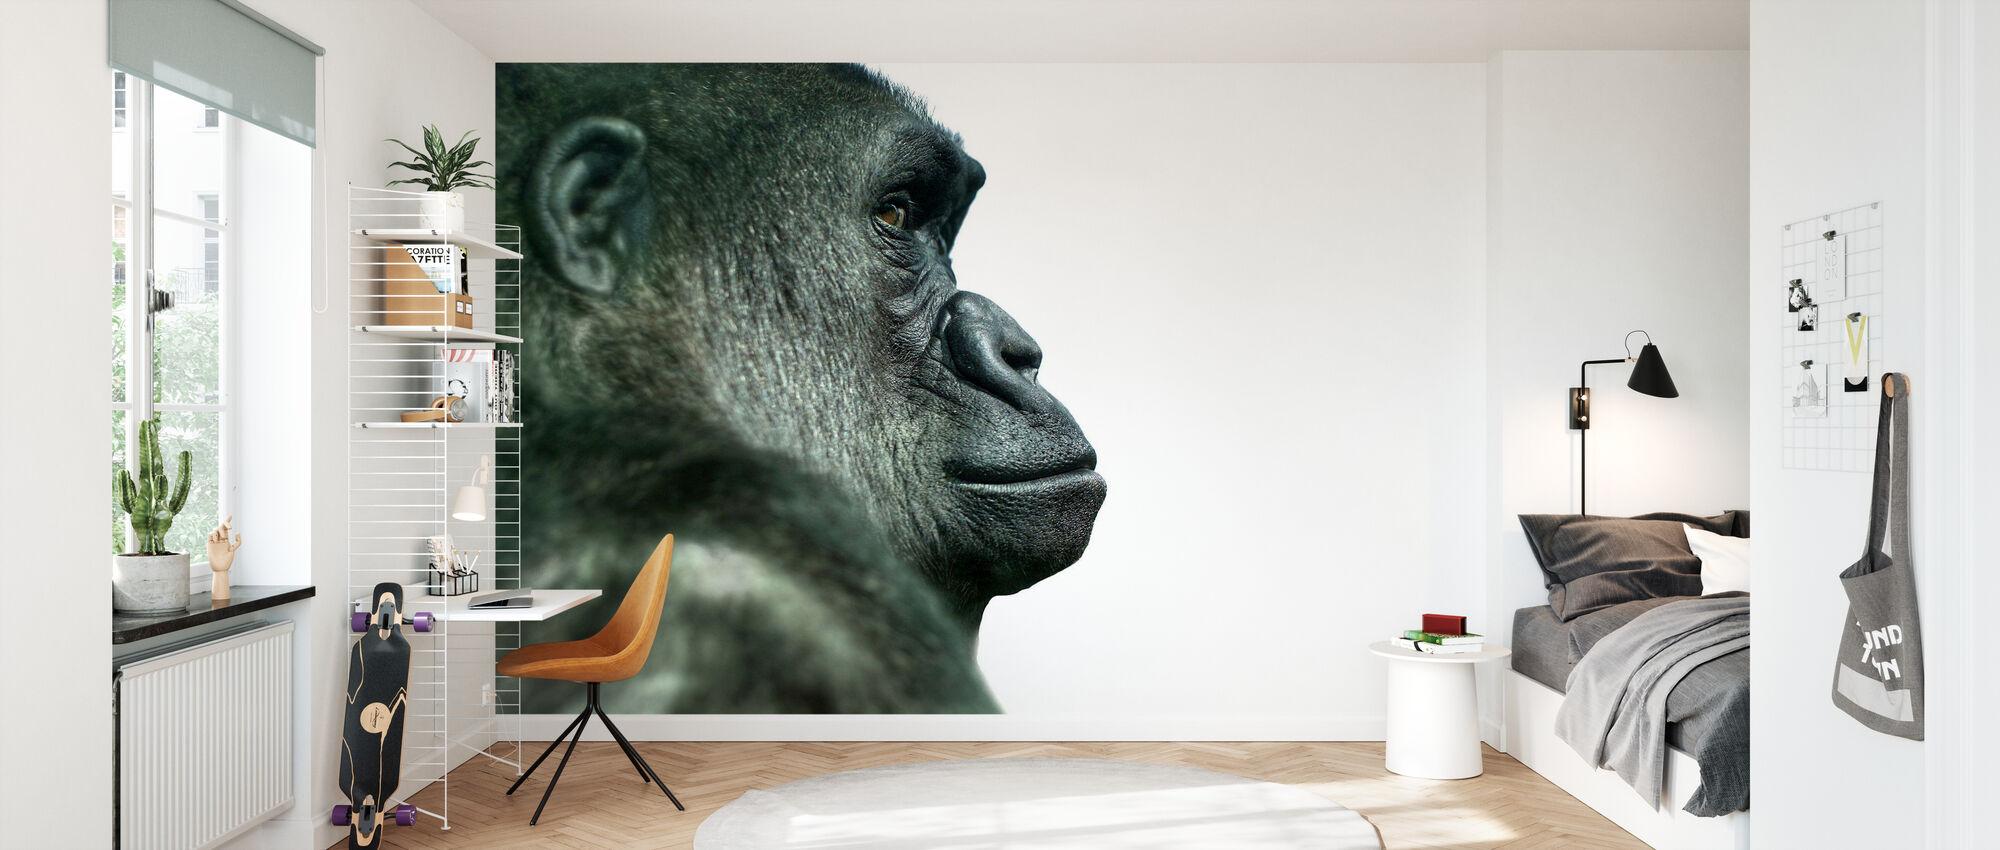 Gorilla - Wallpaper - Kids Room